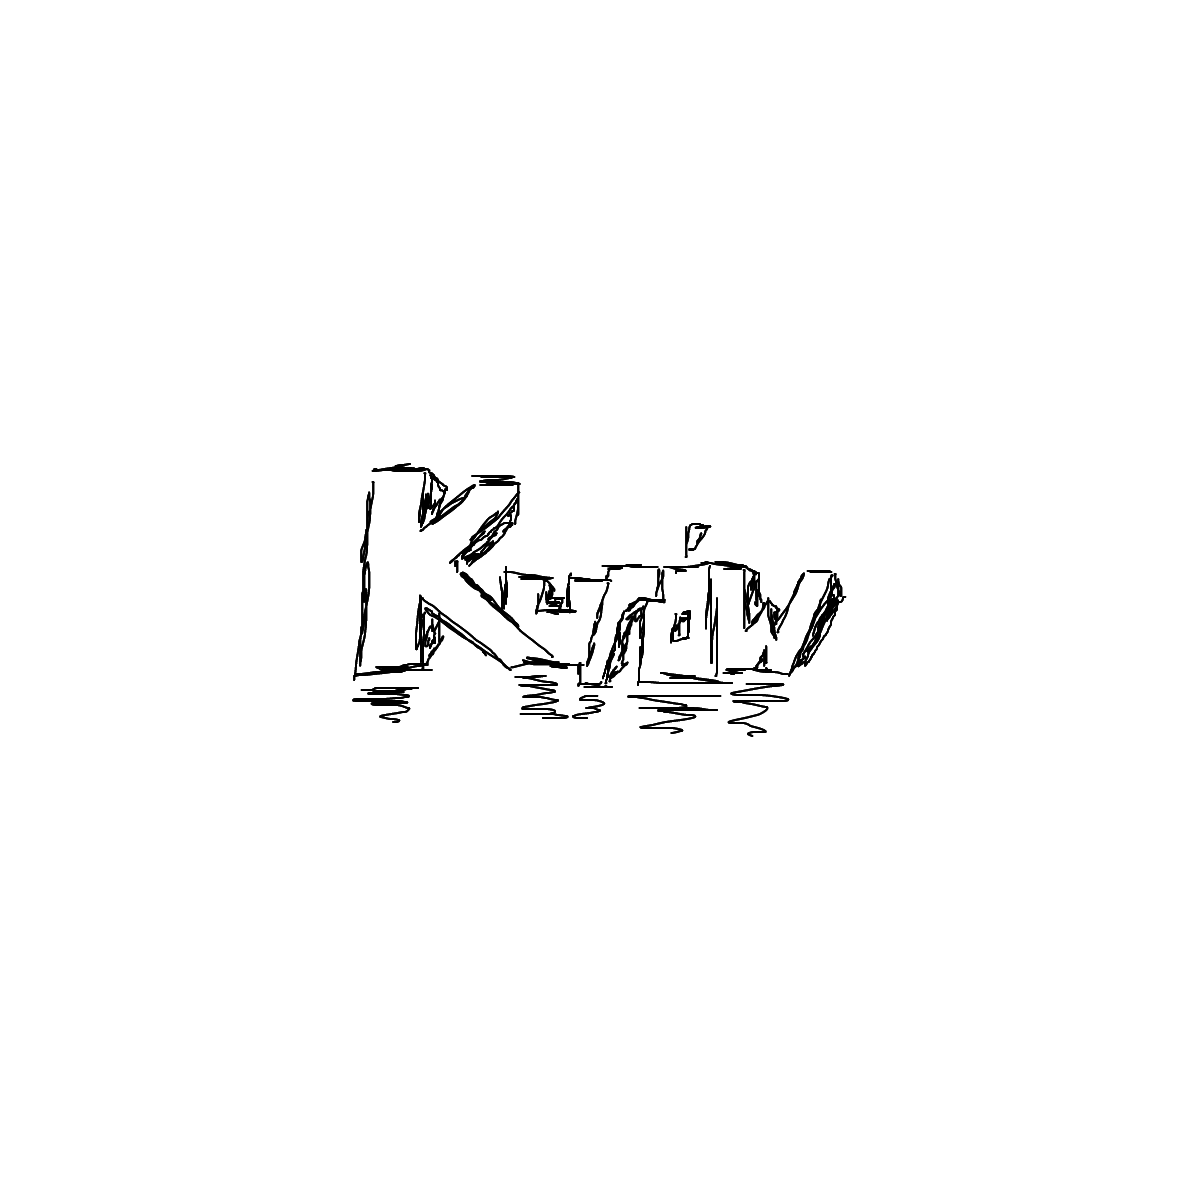 BAAAM drawing#1250 lat:51.3895416259765600lng: 22.1849956512451170